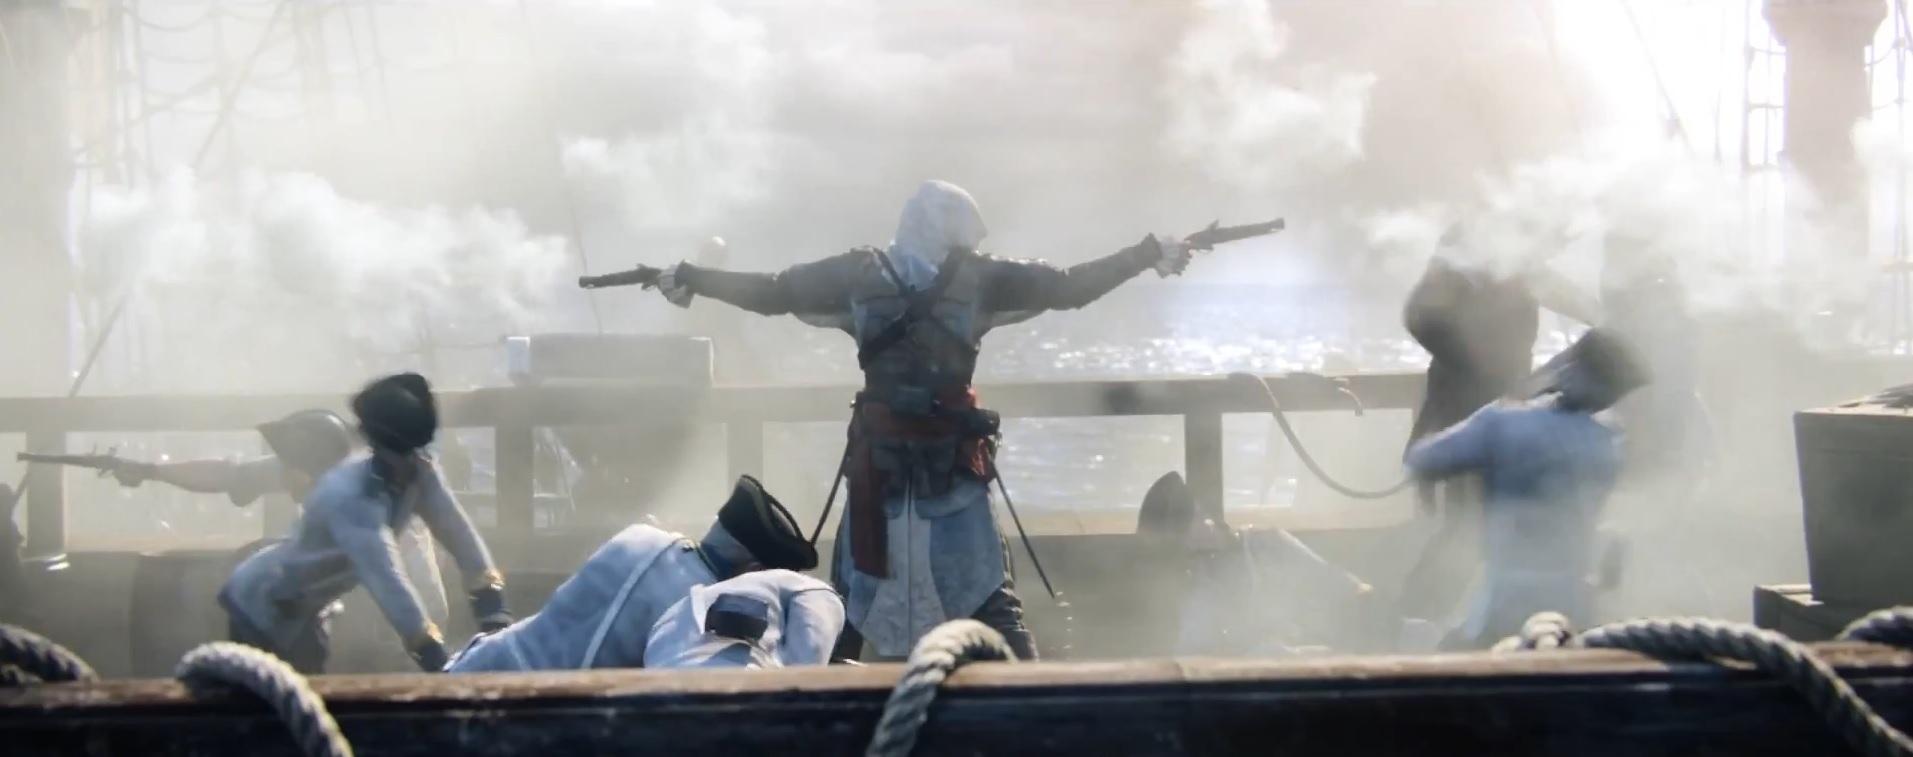 Assassins Creed IV Black Flag wallpaper 13